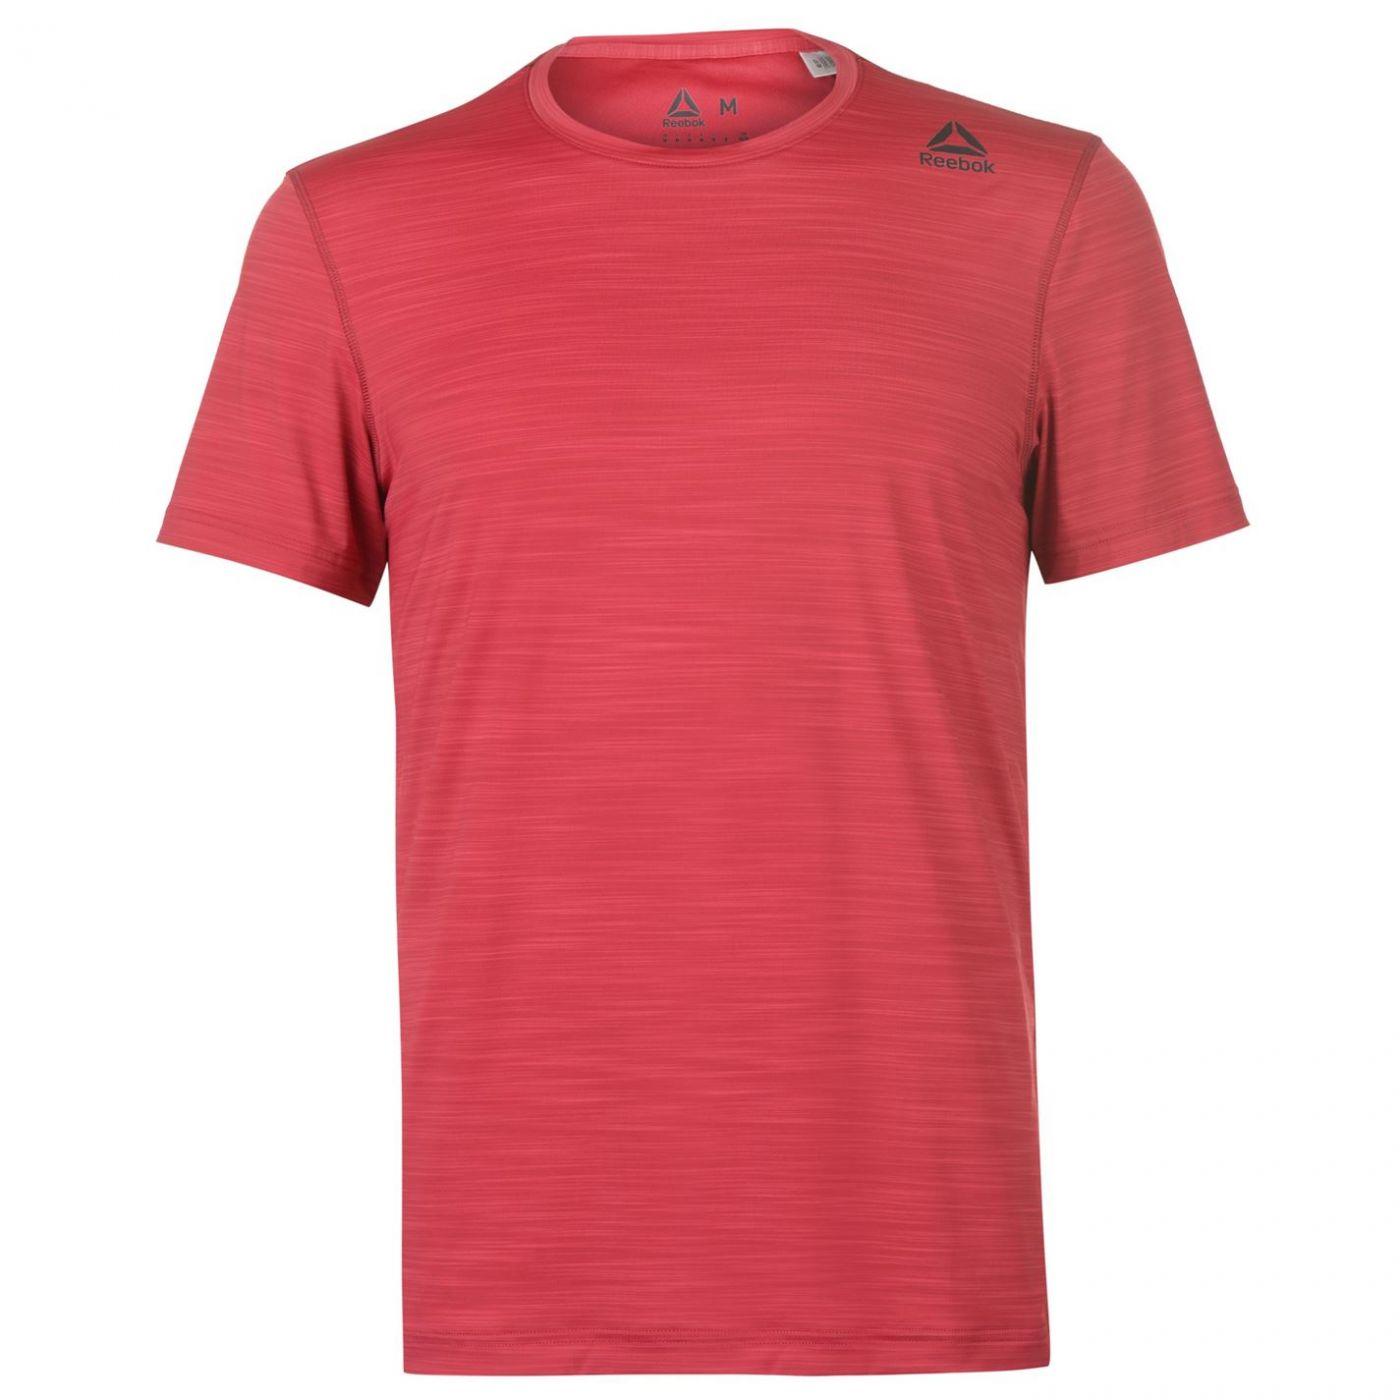 Reebok Active Chill T Shirt Mens